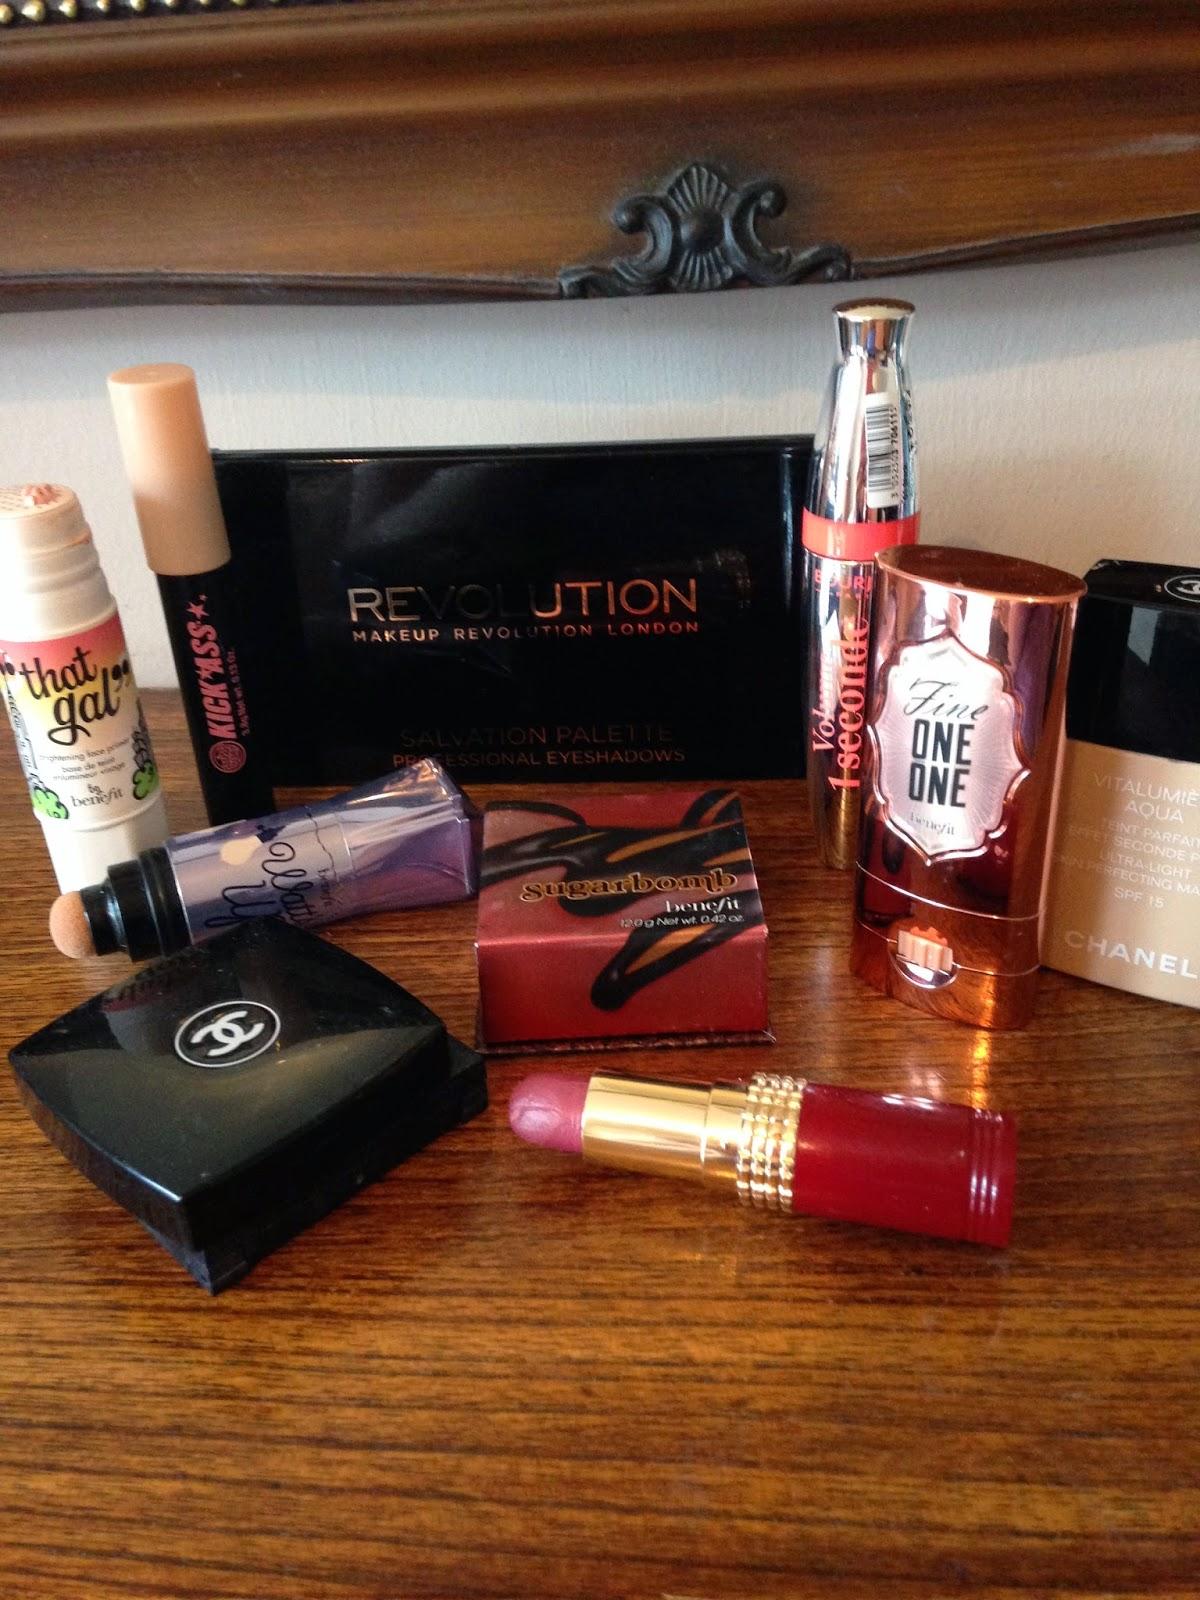 Makeup Revolution; Benefit; Chanel; Elizabeth Arden; Bourjois; Soap & Glory